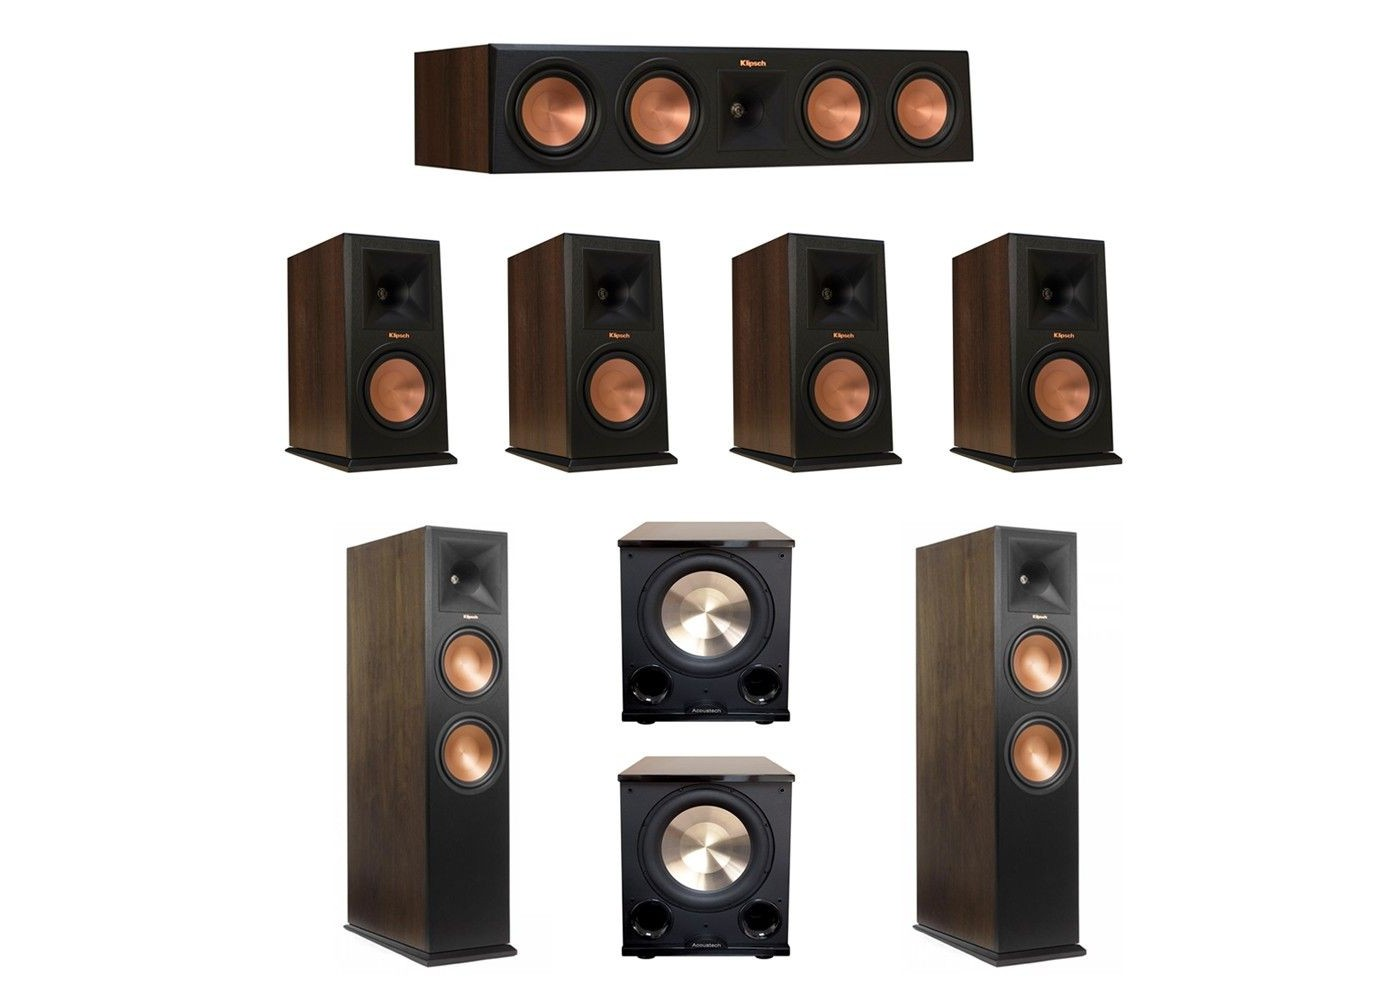 Klipsch Walnut 72 System With 2 RP 280FA Tower Speakers 1 450C Center Speaker